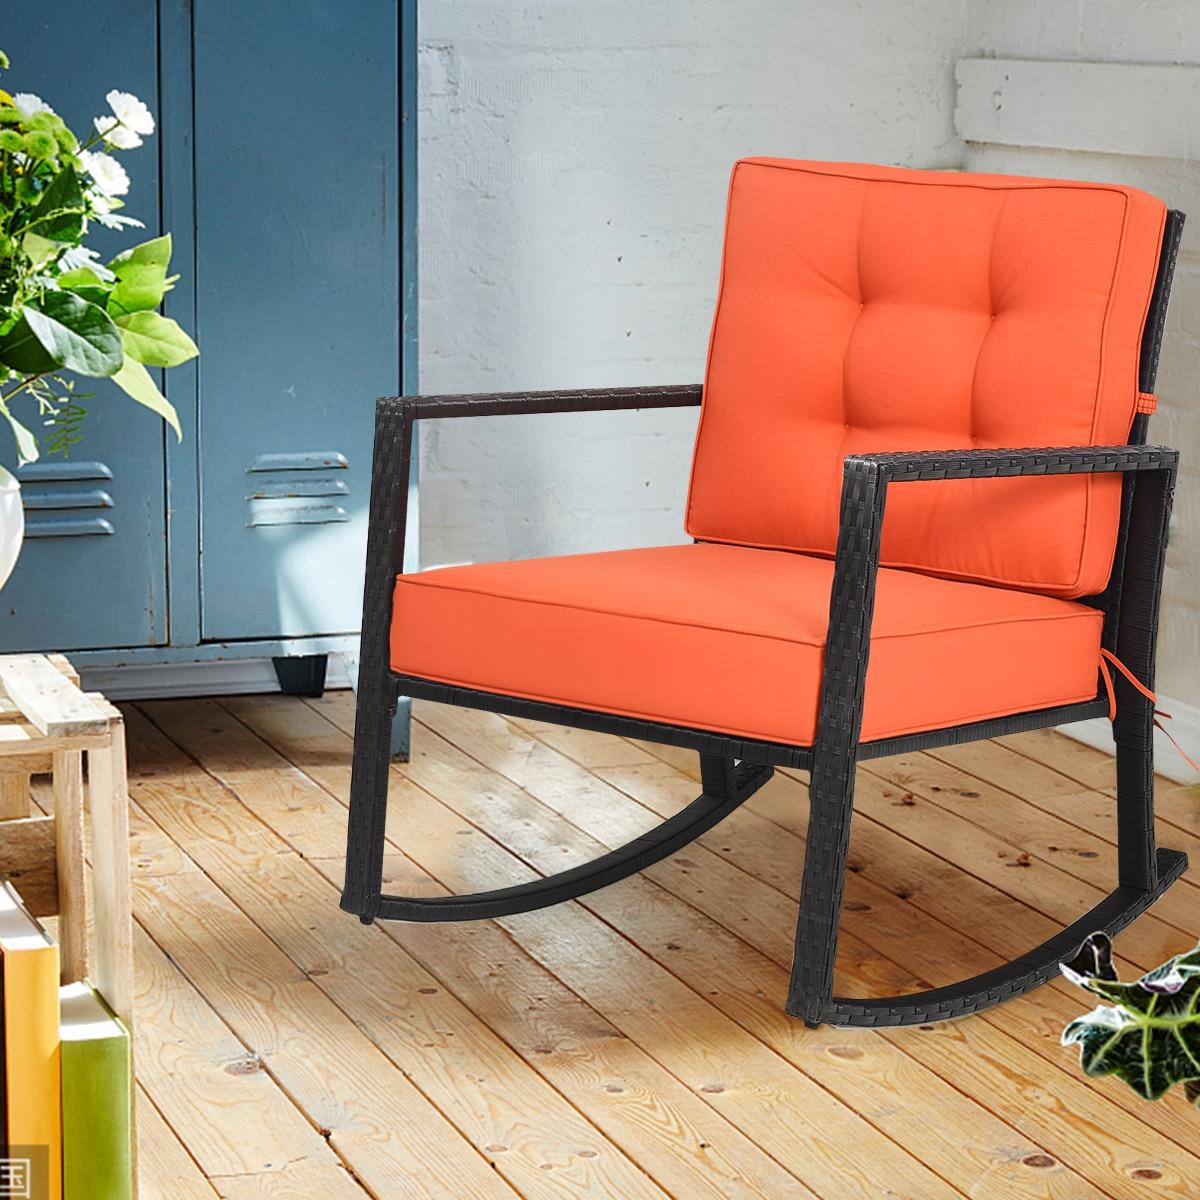 Costway Patio Rattan Rocker Chair Outdoor Glider Wicker Rocking Chair Cushion Lawn Deck